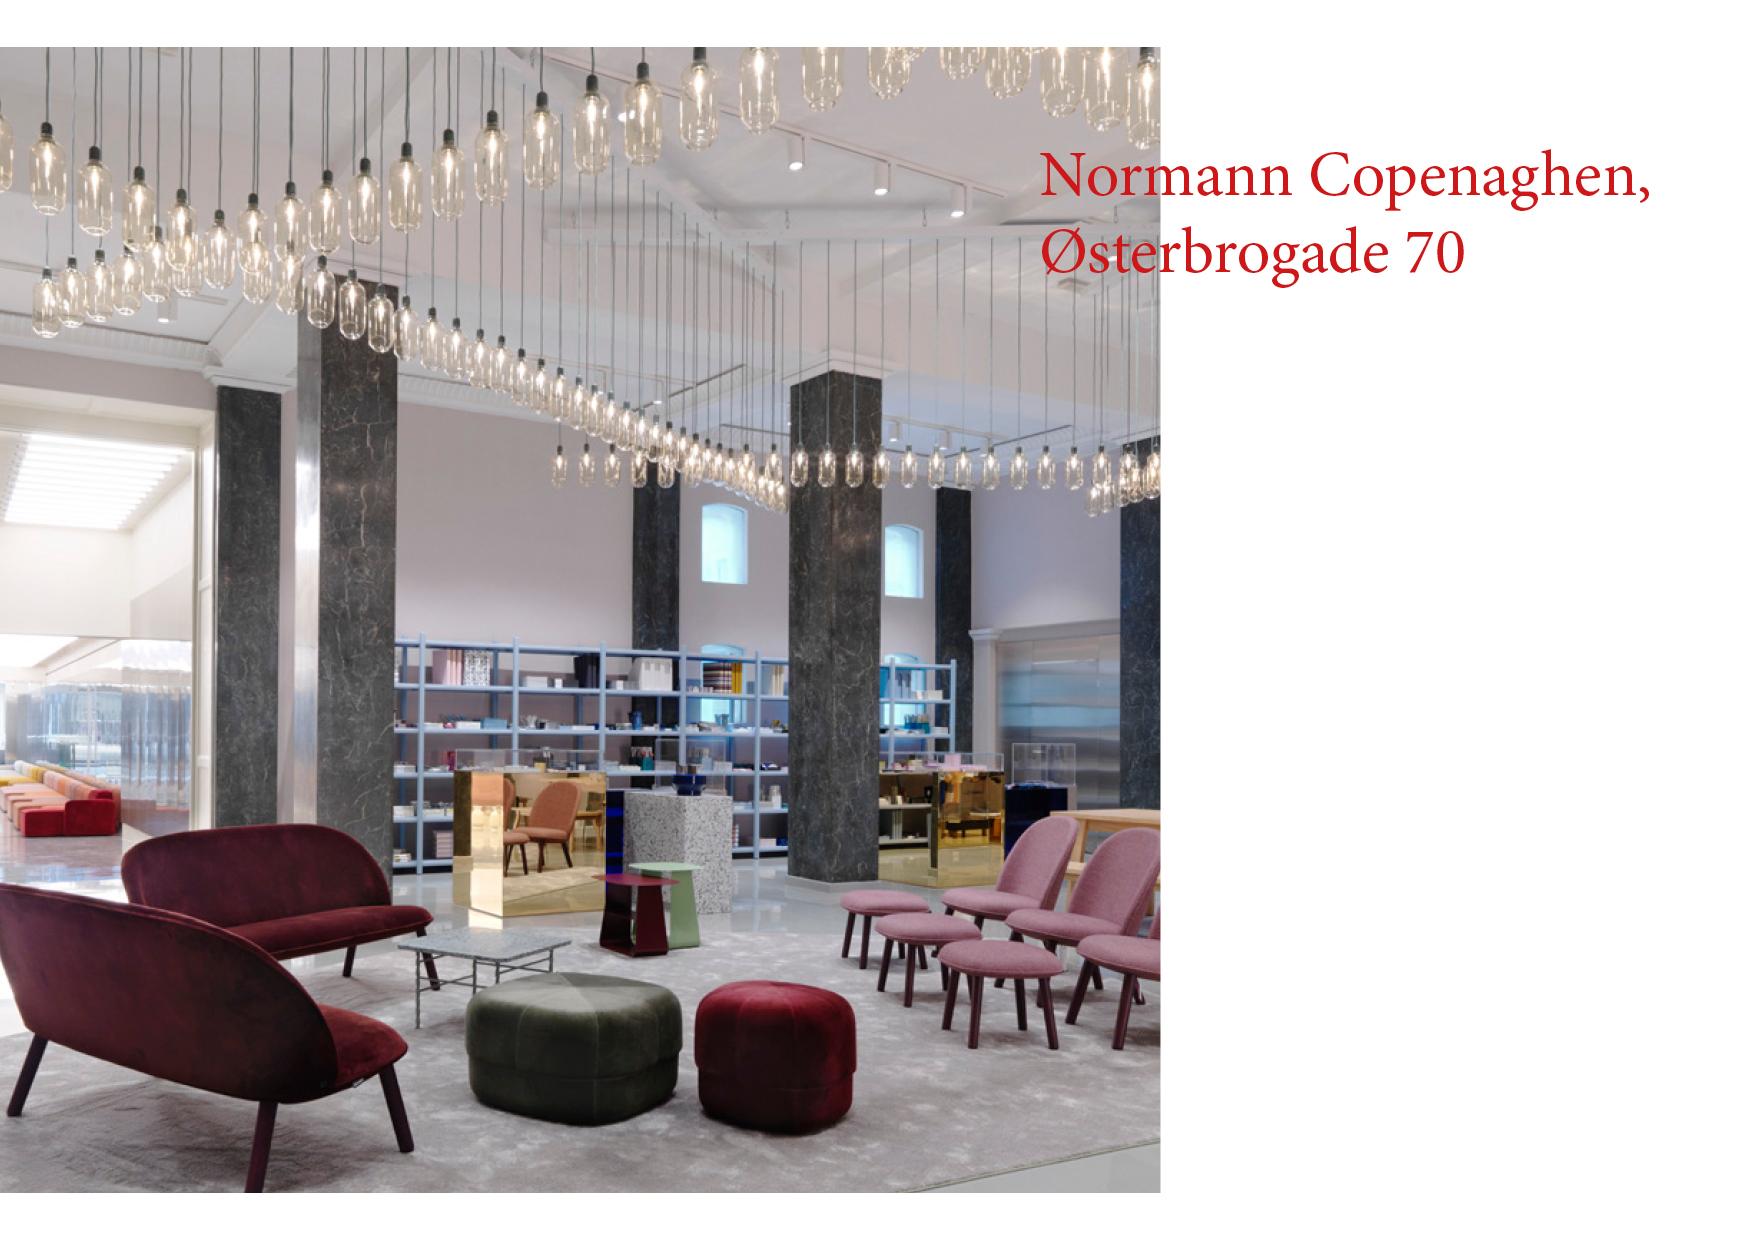 Copenaghen10